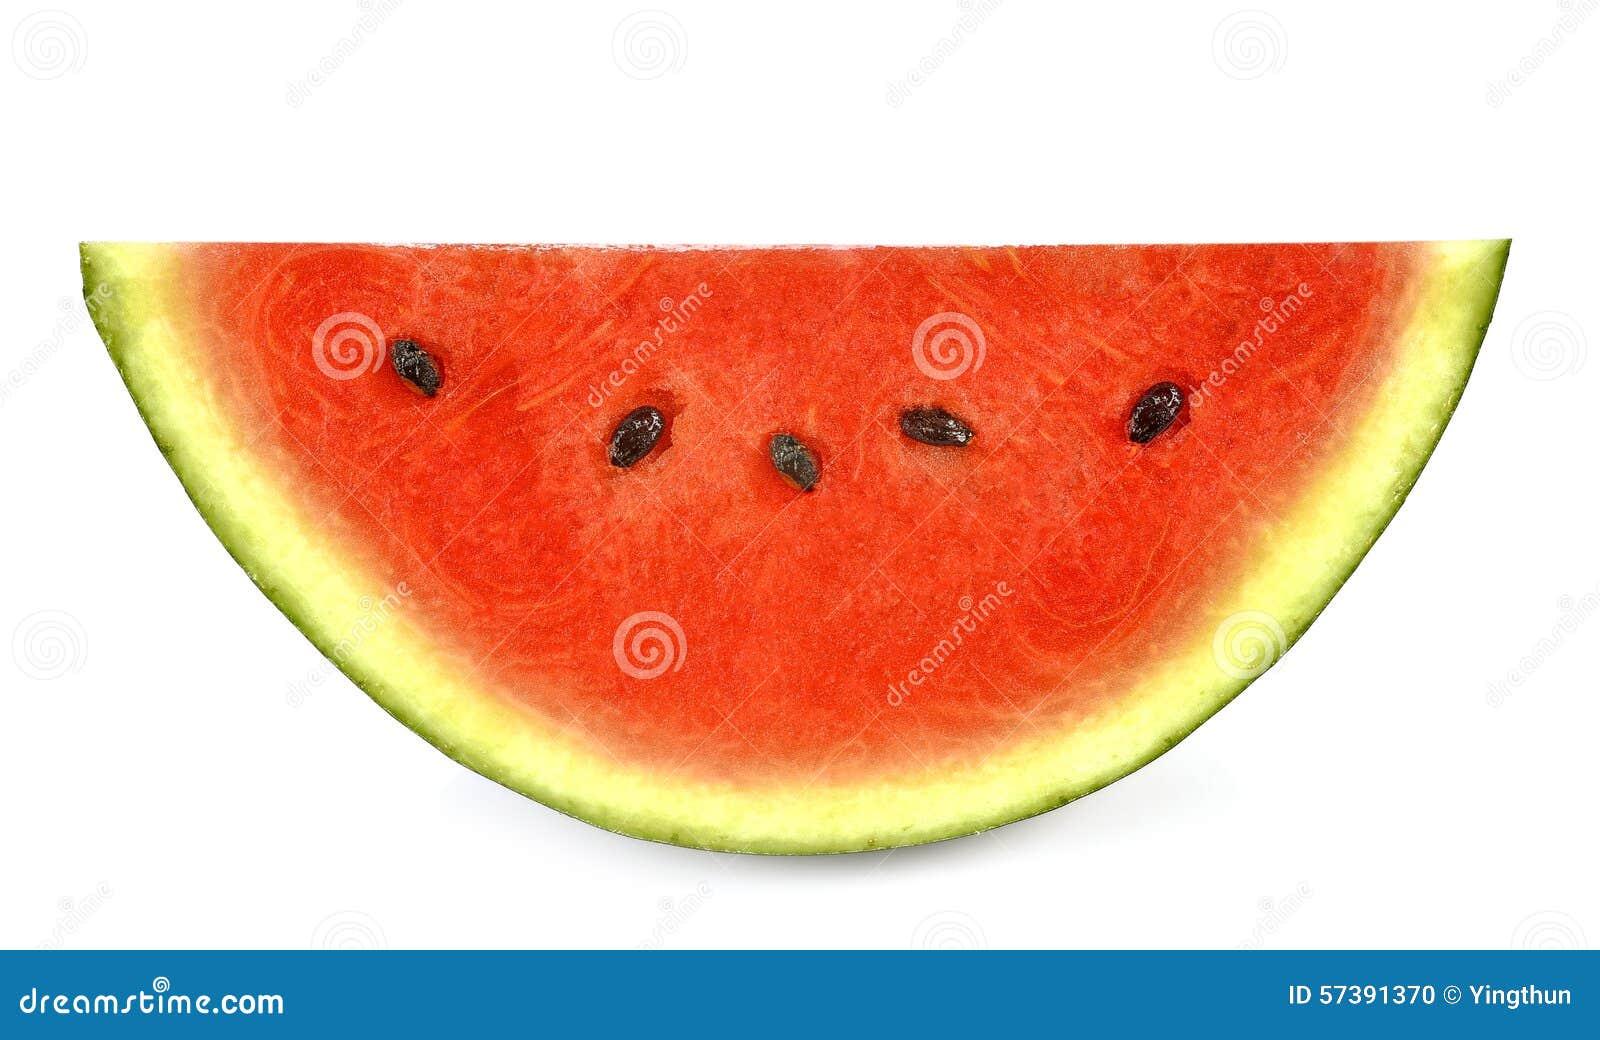 Plak van watermeloen witte achtergrond